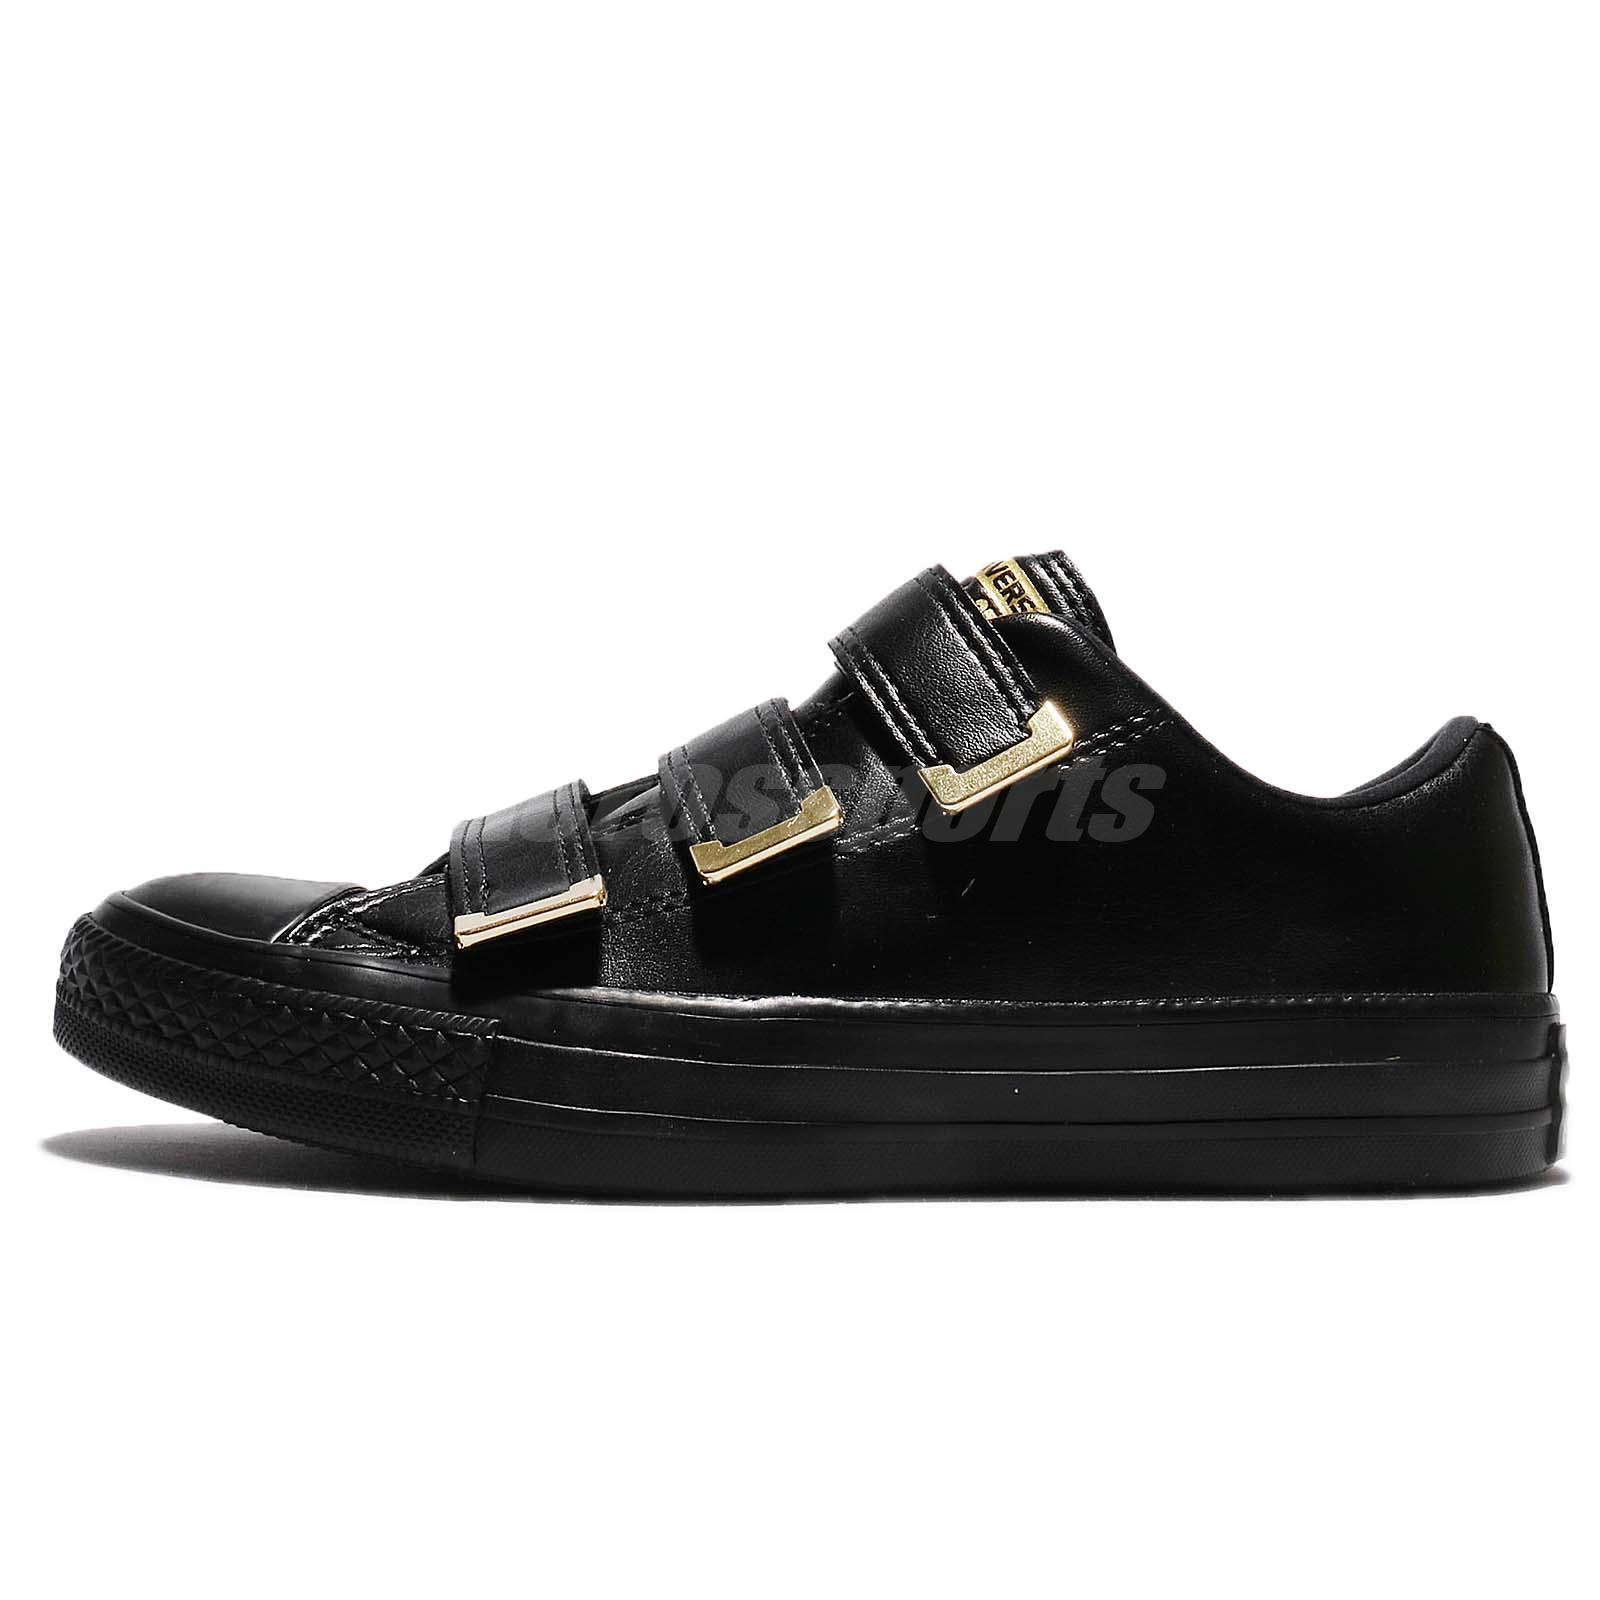 b7180fa495b40e Converse Chuck Taylor All Star 3V Low Strap Black Gold Women Shoes 559906C